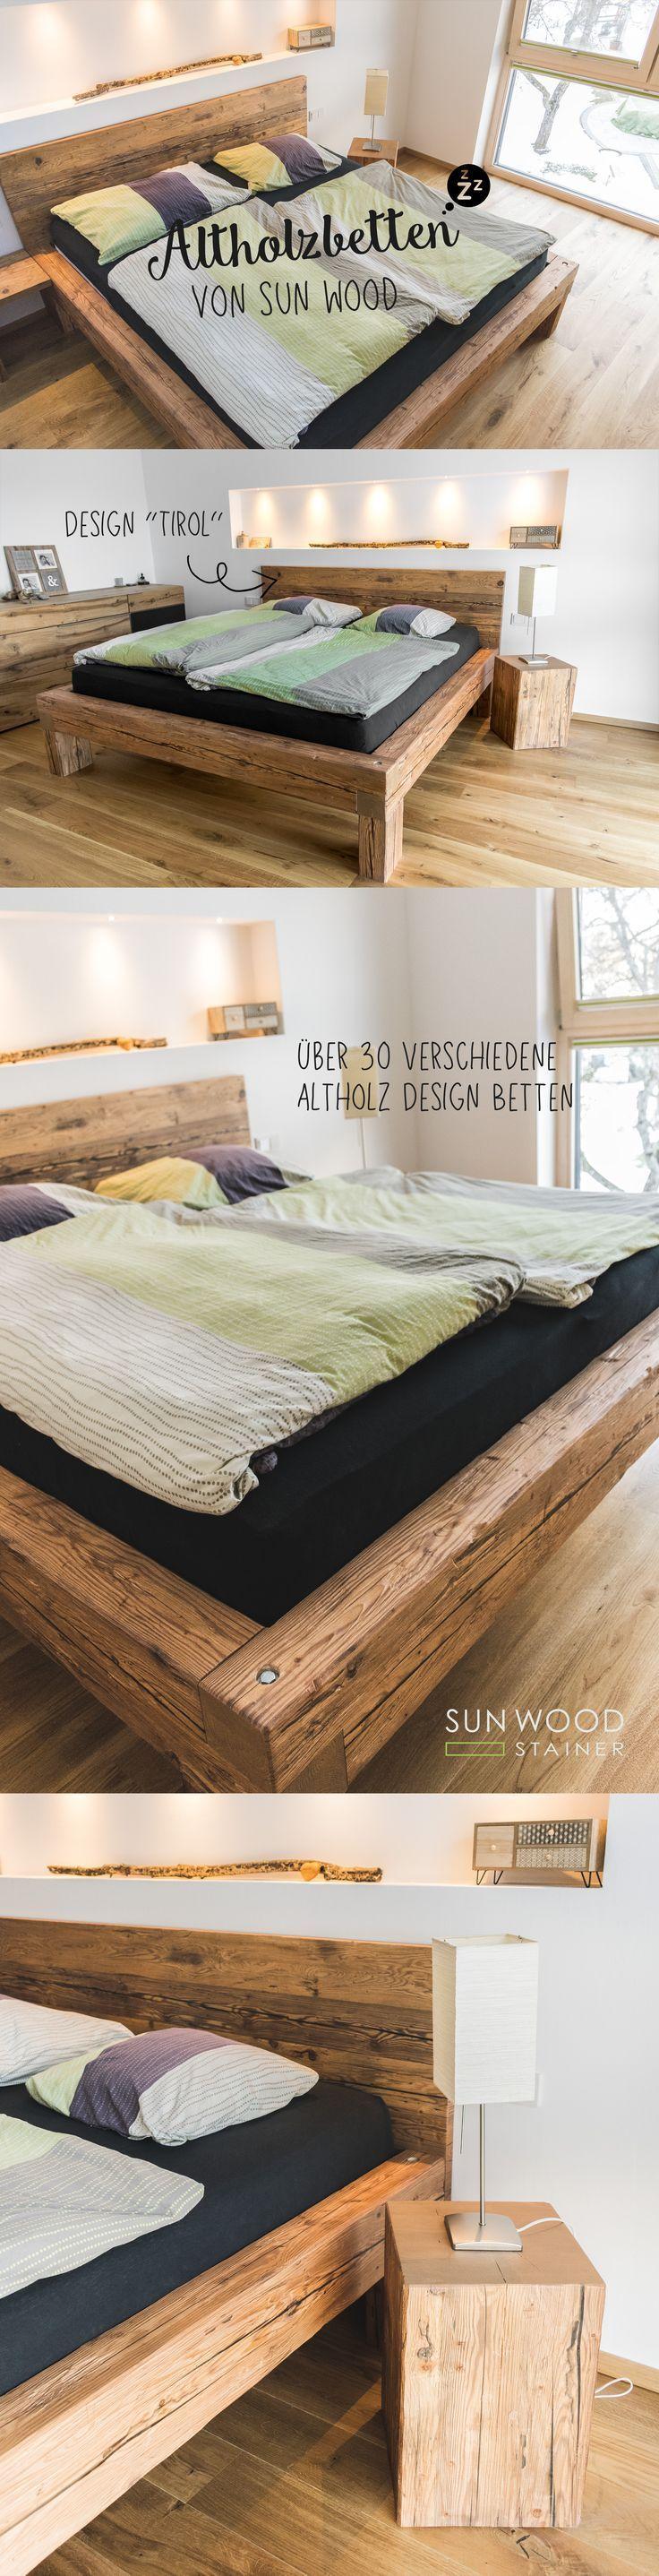 Designerbett aus alten Holzbalken – altes Holzbett, Balkenbett, Schlafzimmer, Schlafzimmer, … - Holz DIY Ideen #altesholz